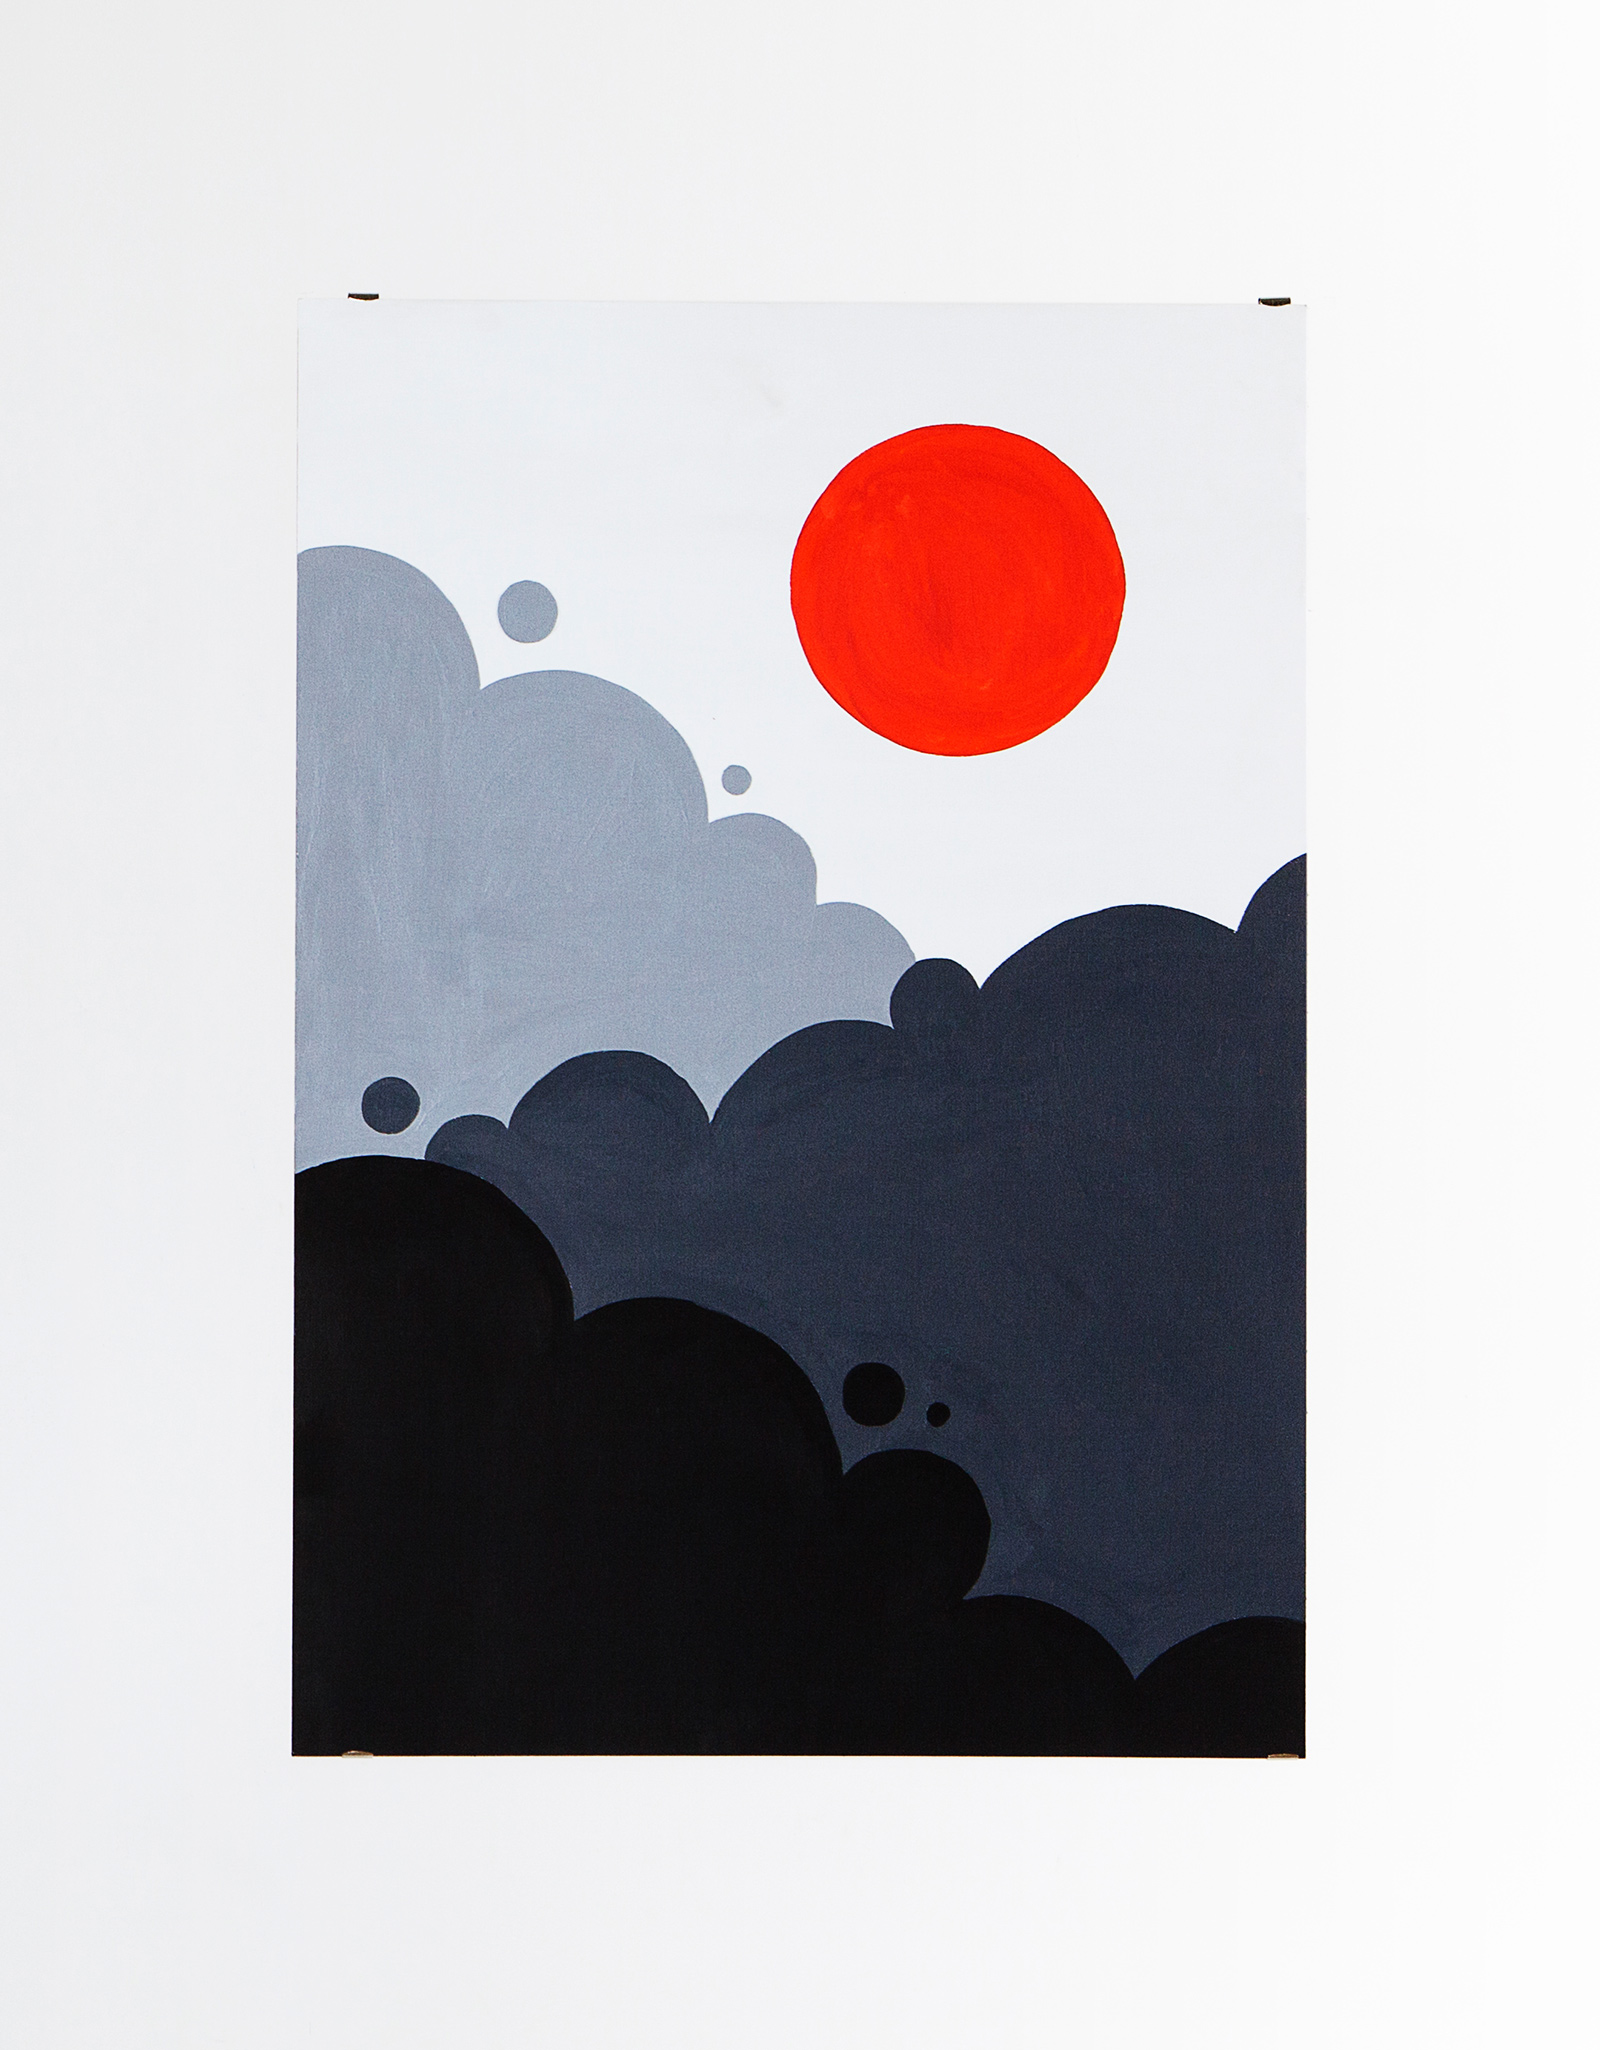 La Scighera    Acrylic on canvas, 70x100cm 2014